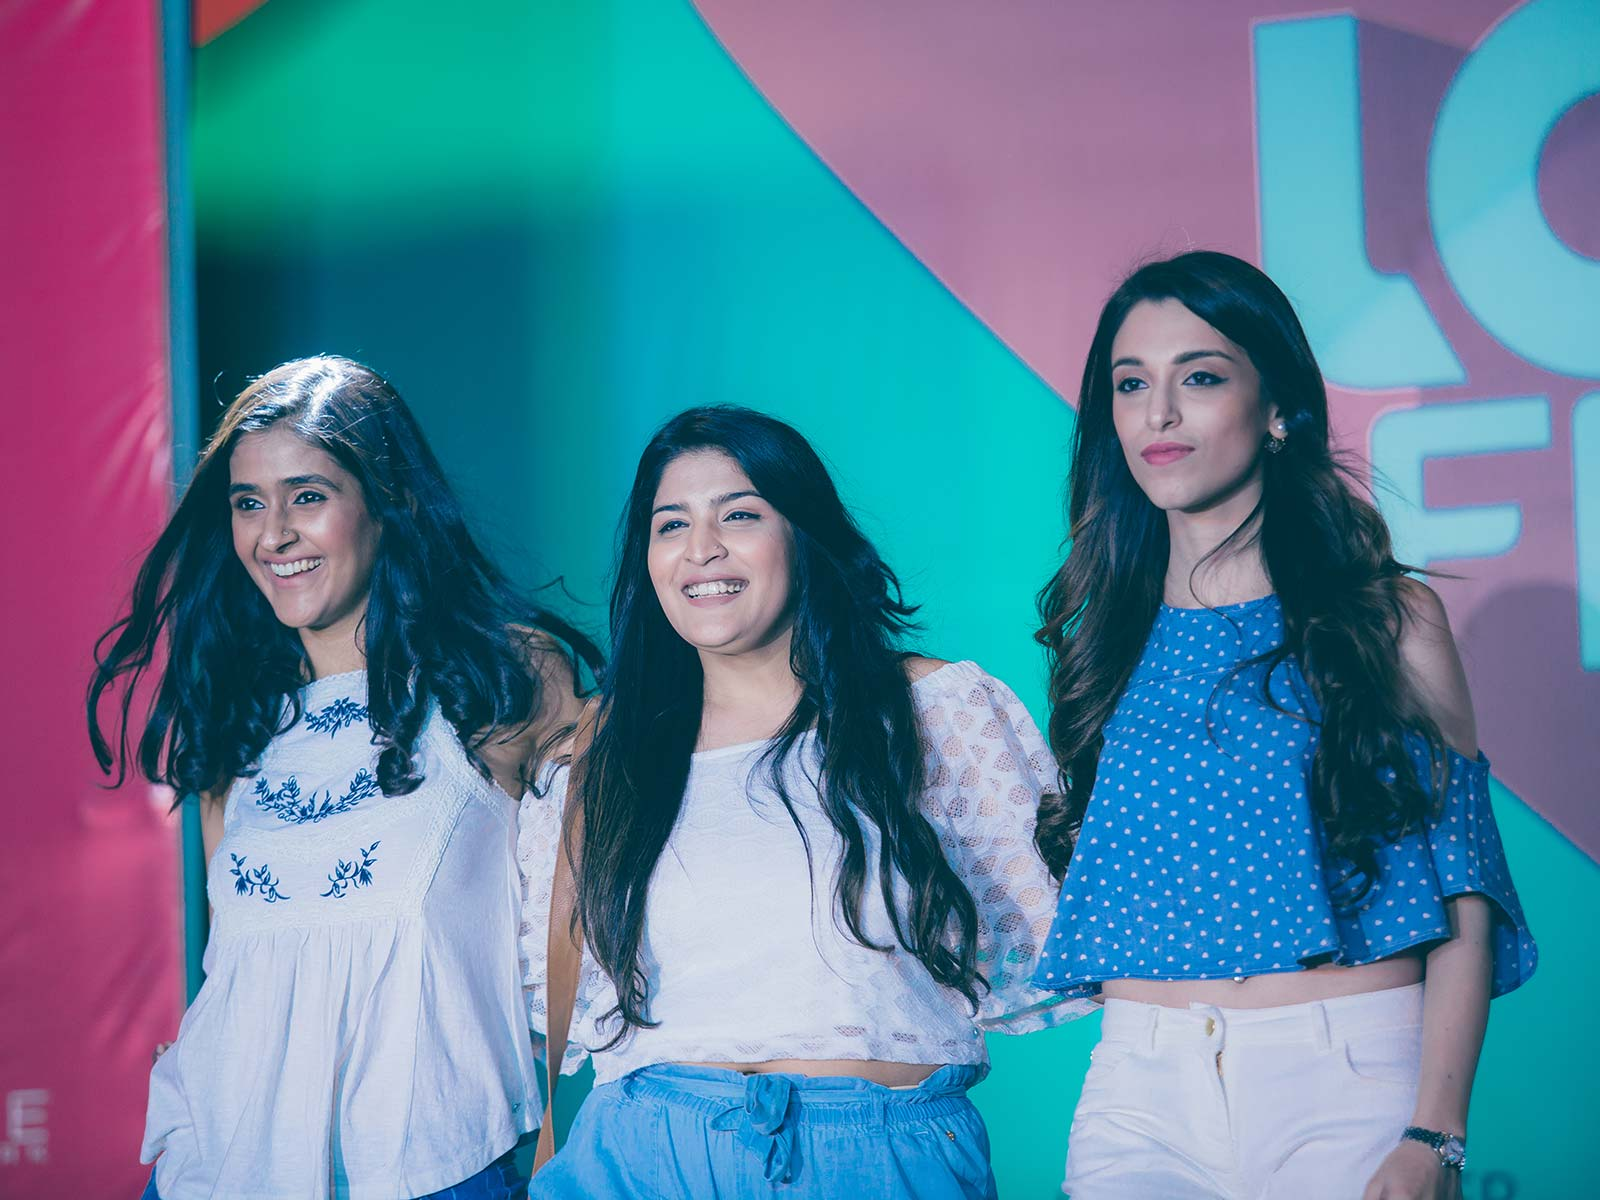 Shreya Kalra, Shreya Jain and Maia Sethna walk the ramp for Westside at the POPxo Love Fest